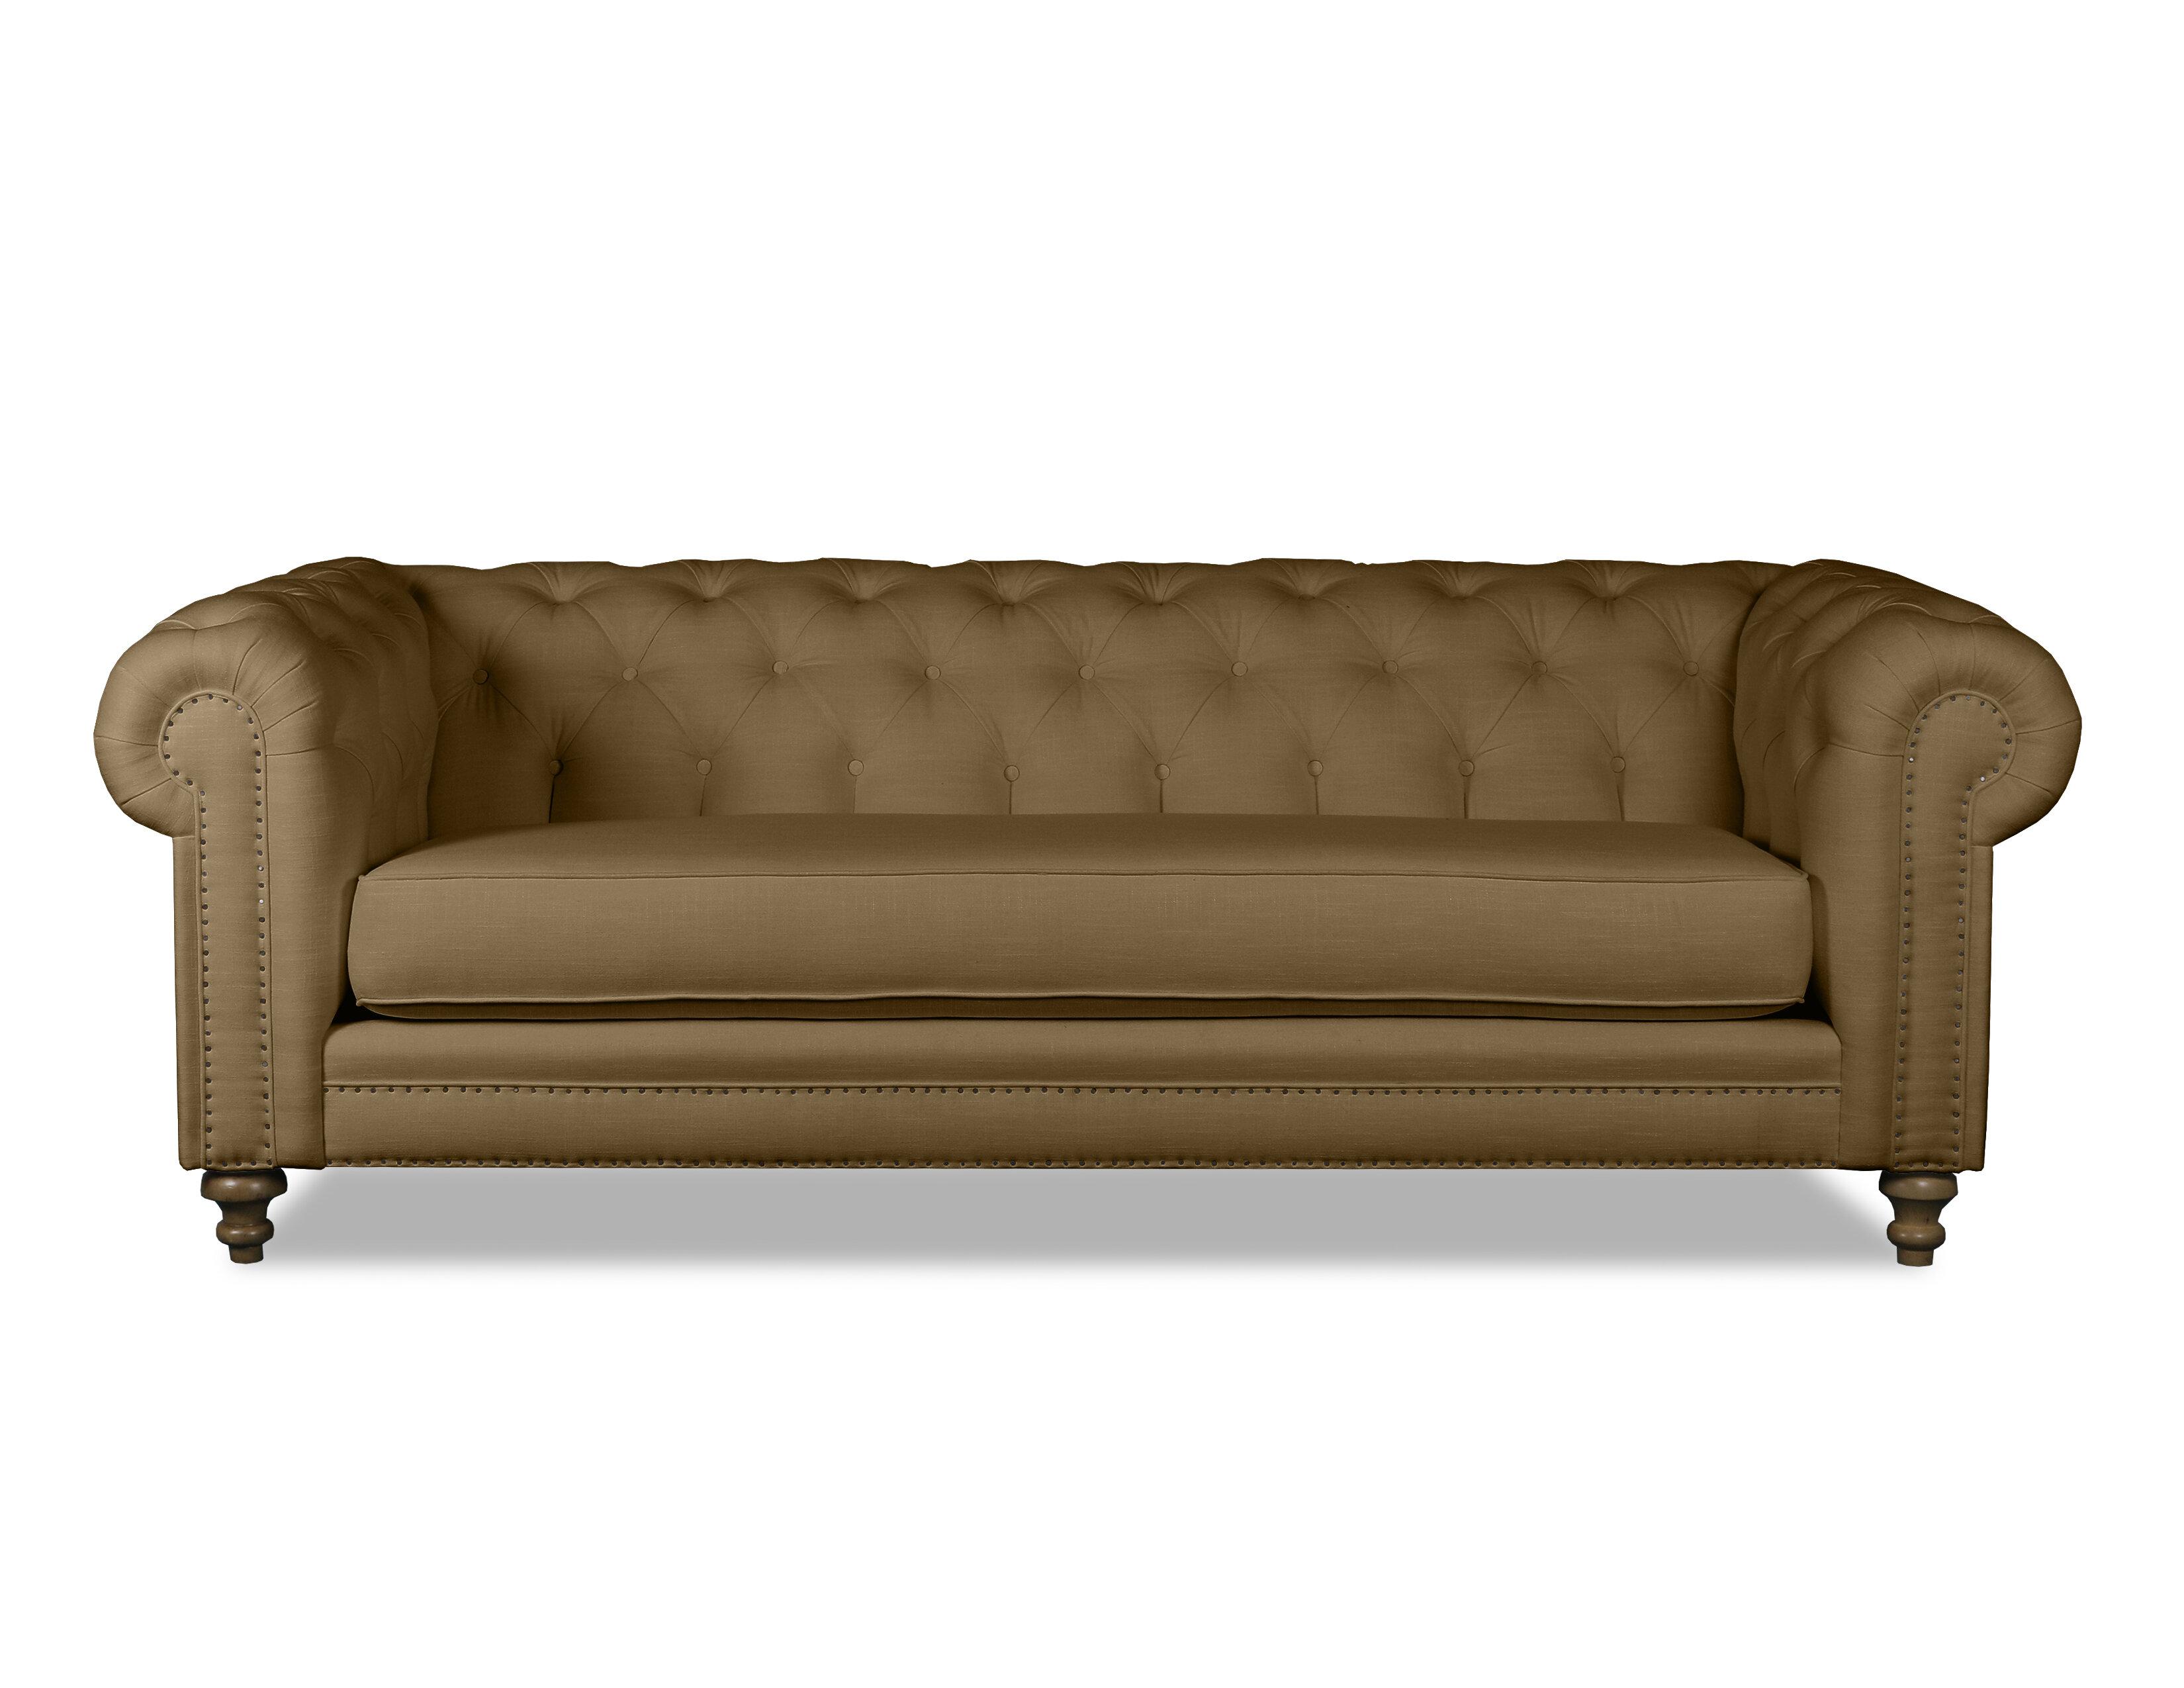 Benites Tufted Linen Chesterfield Sofa